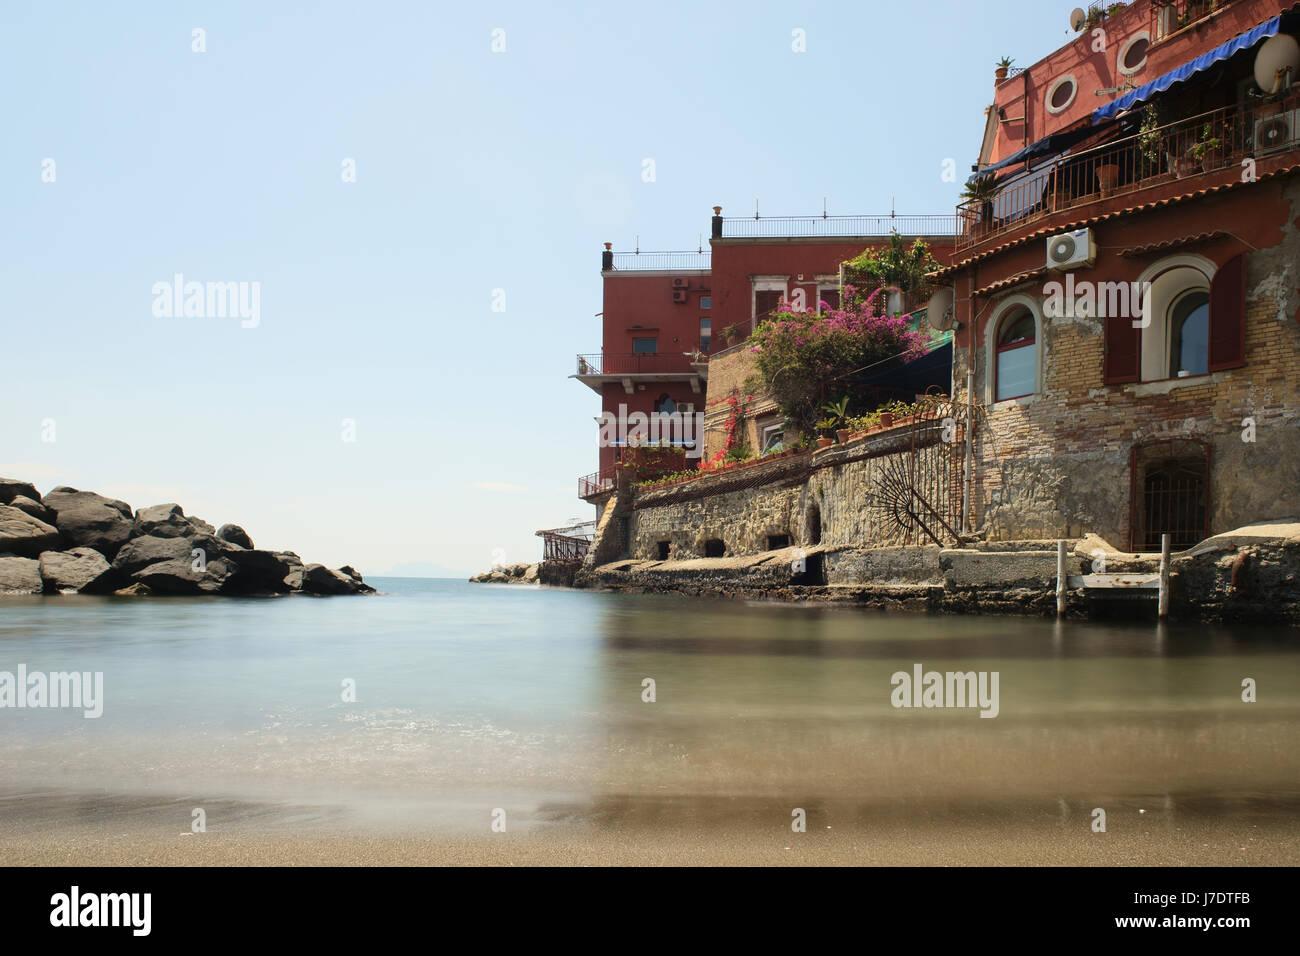 Bagno sirena sirena beach in neapel italien posillipo